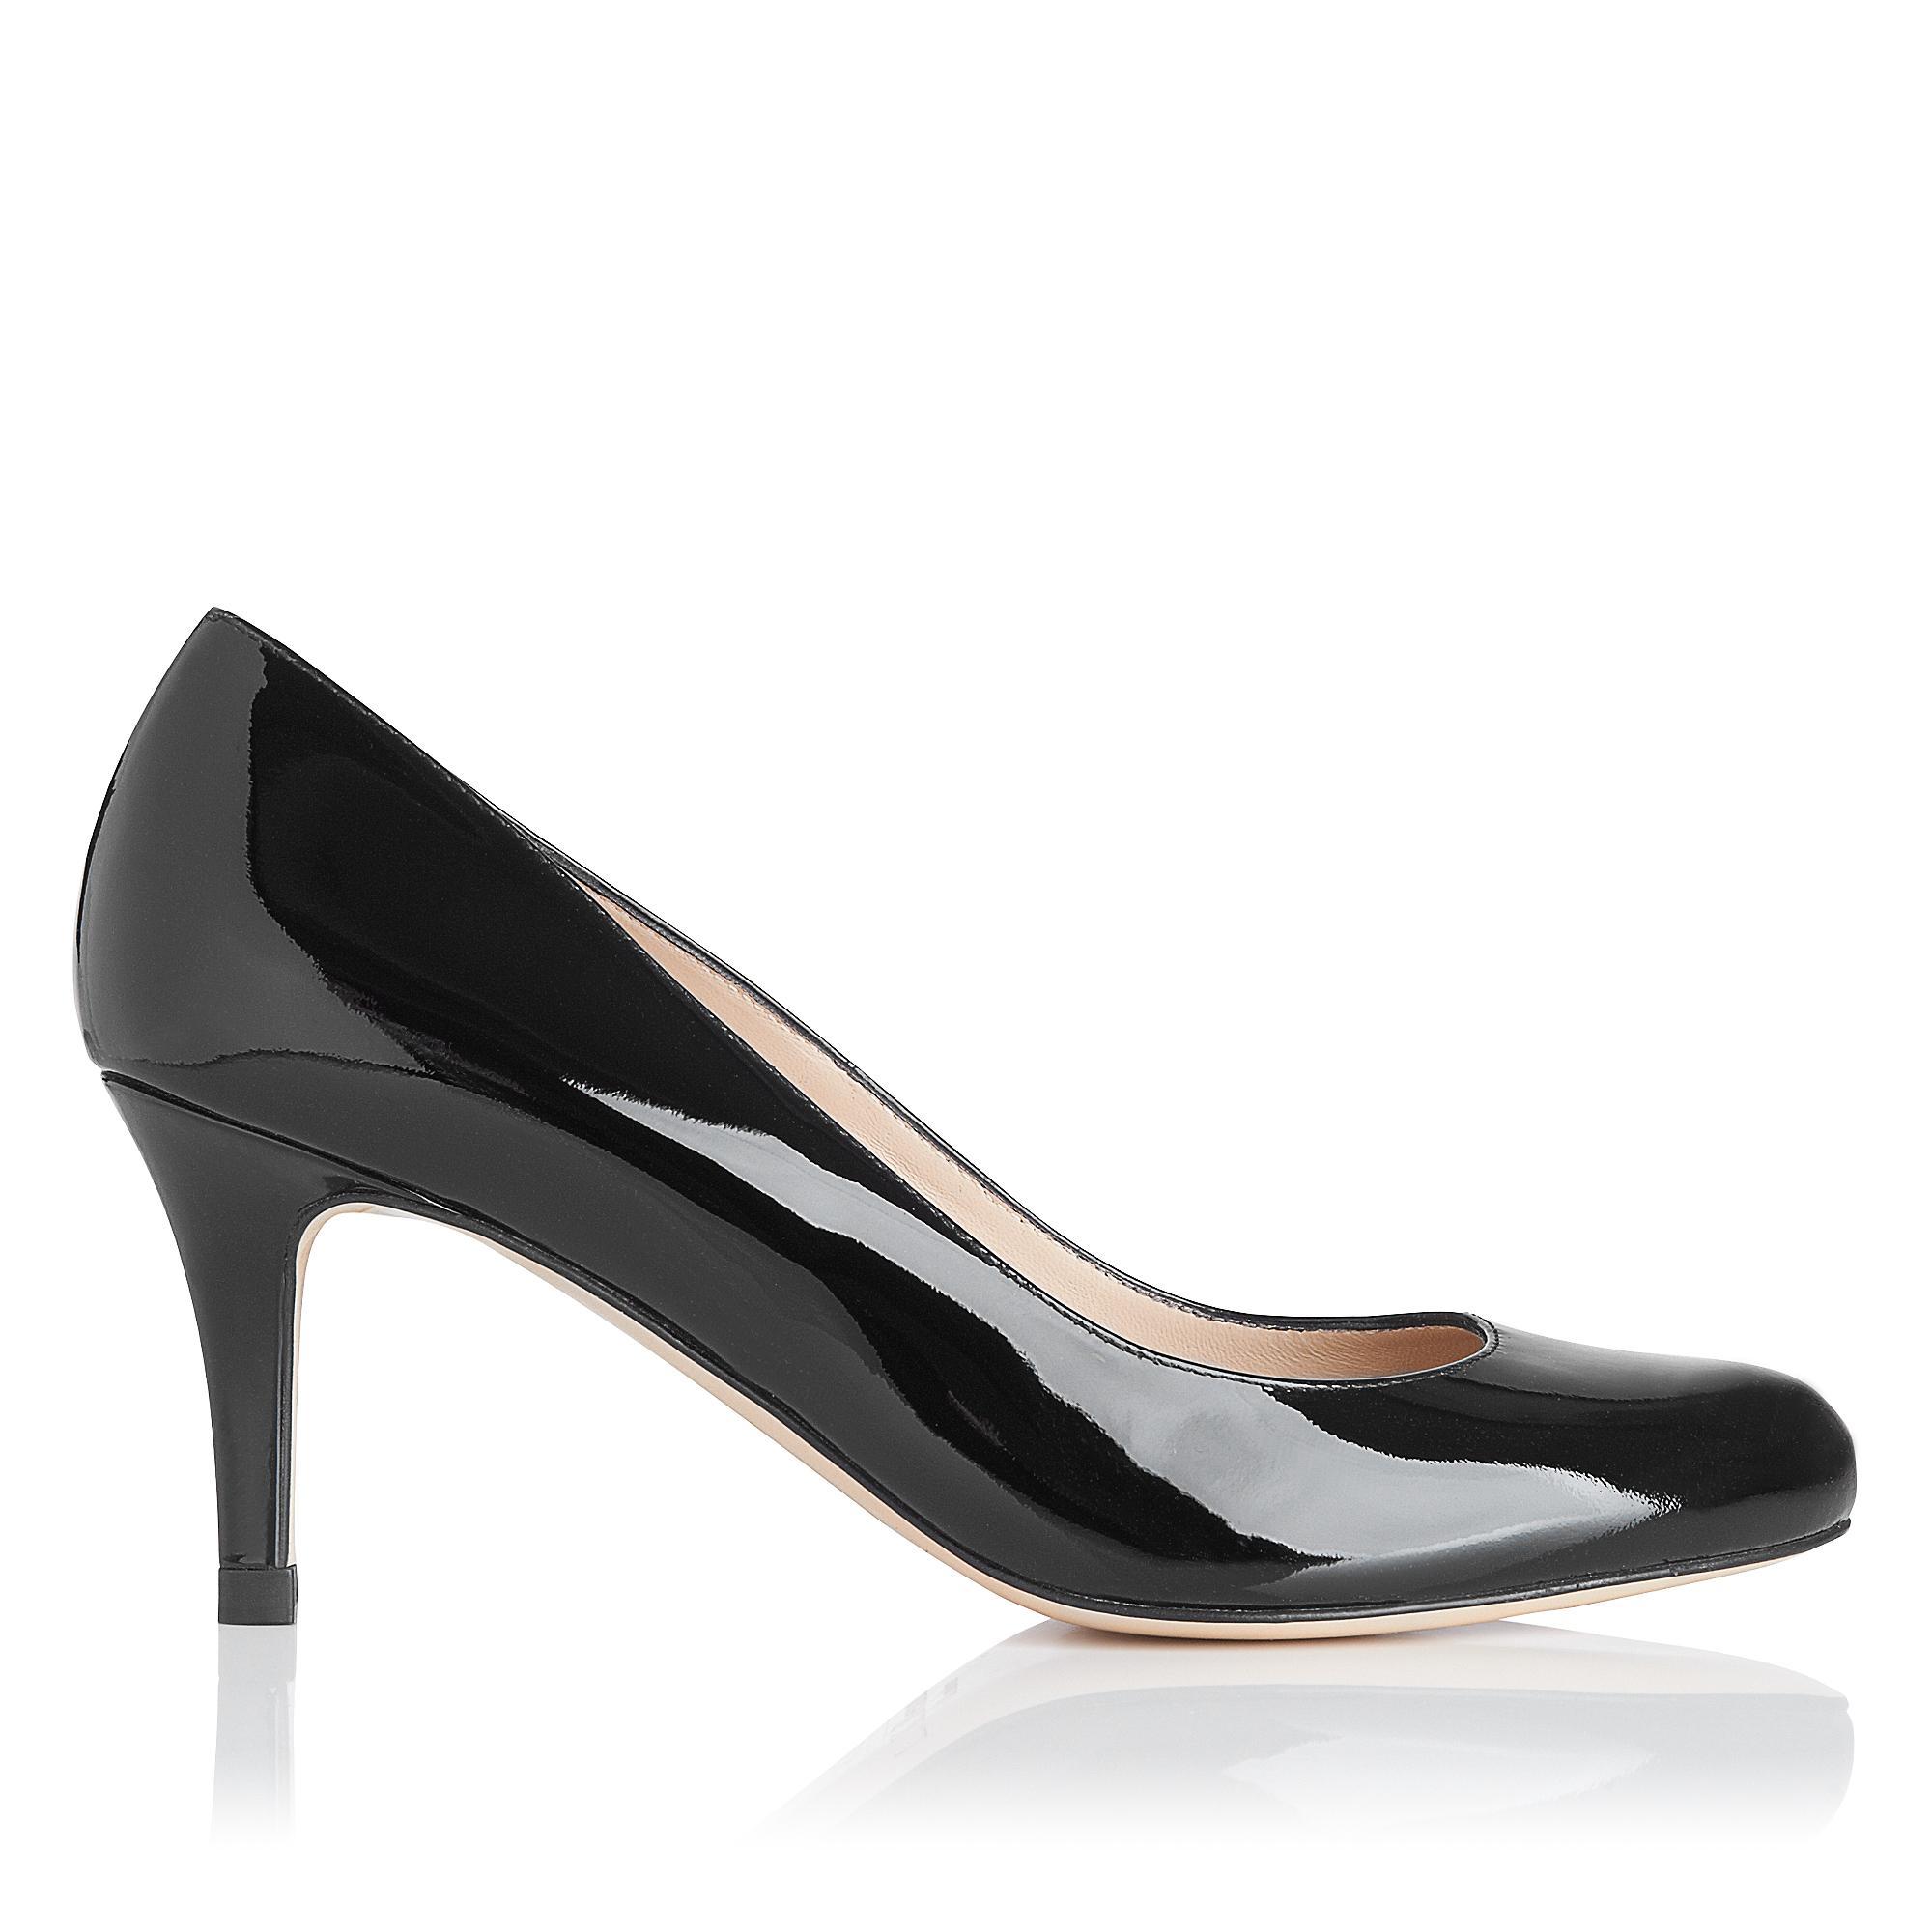 Samira Patent Leather Heel